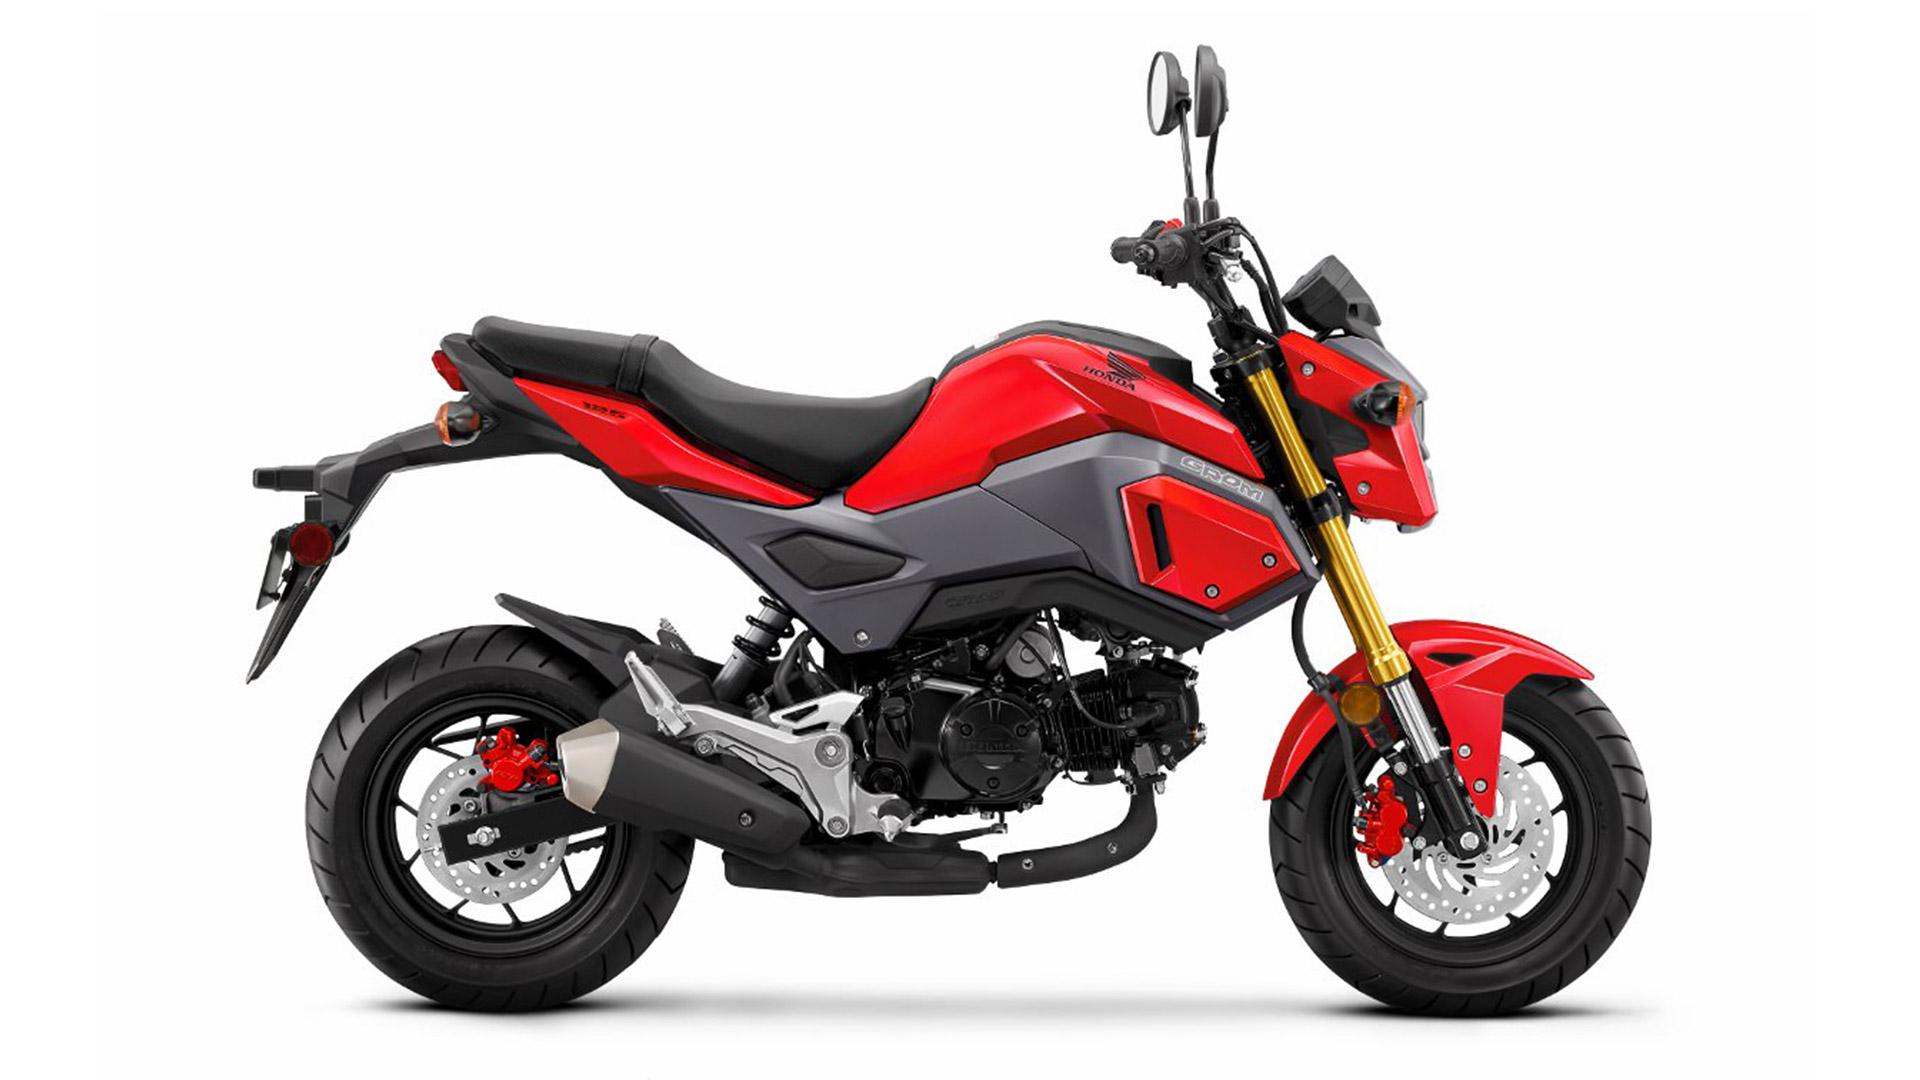 Honda Grom Price >> Honda Msx125 Grom 2018 Price Mileage Reviews Specification